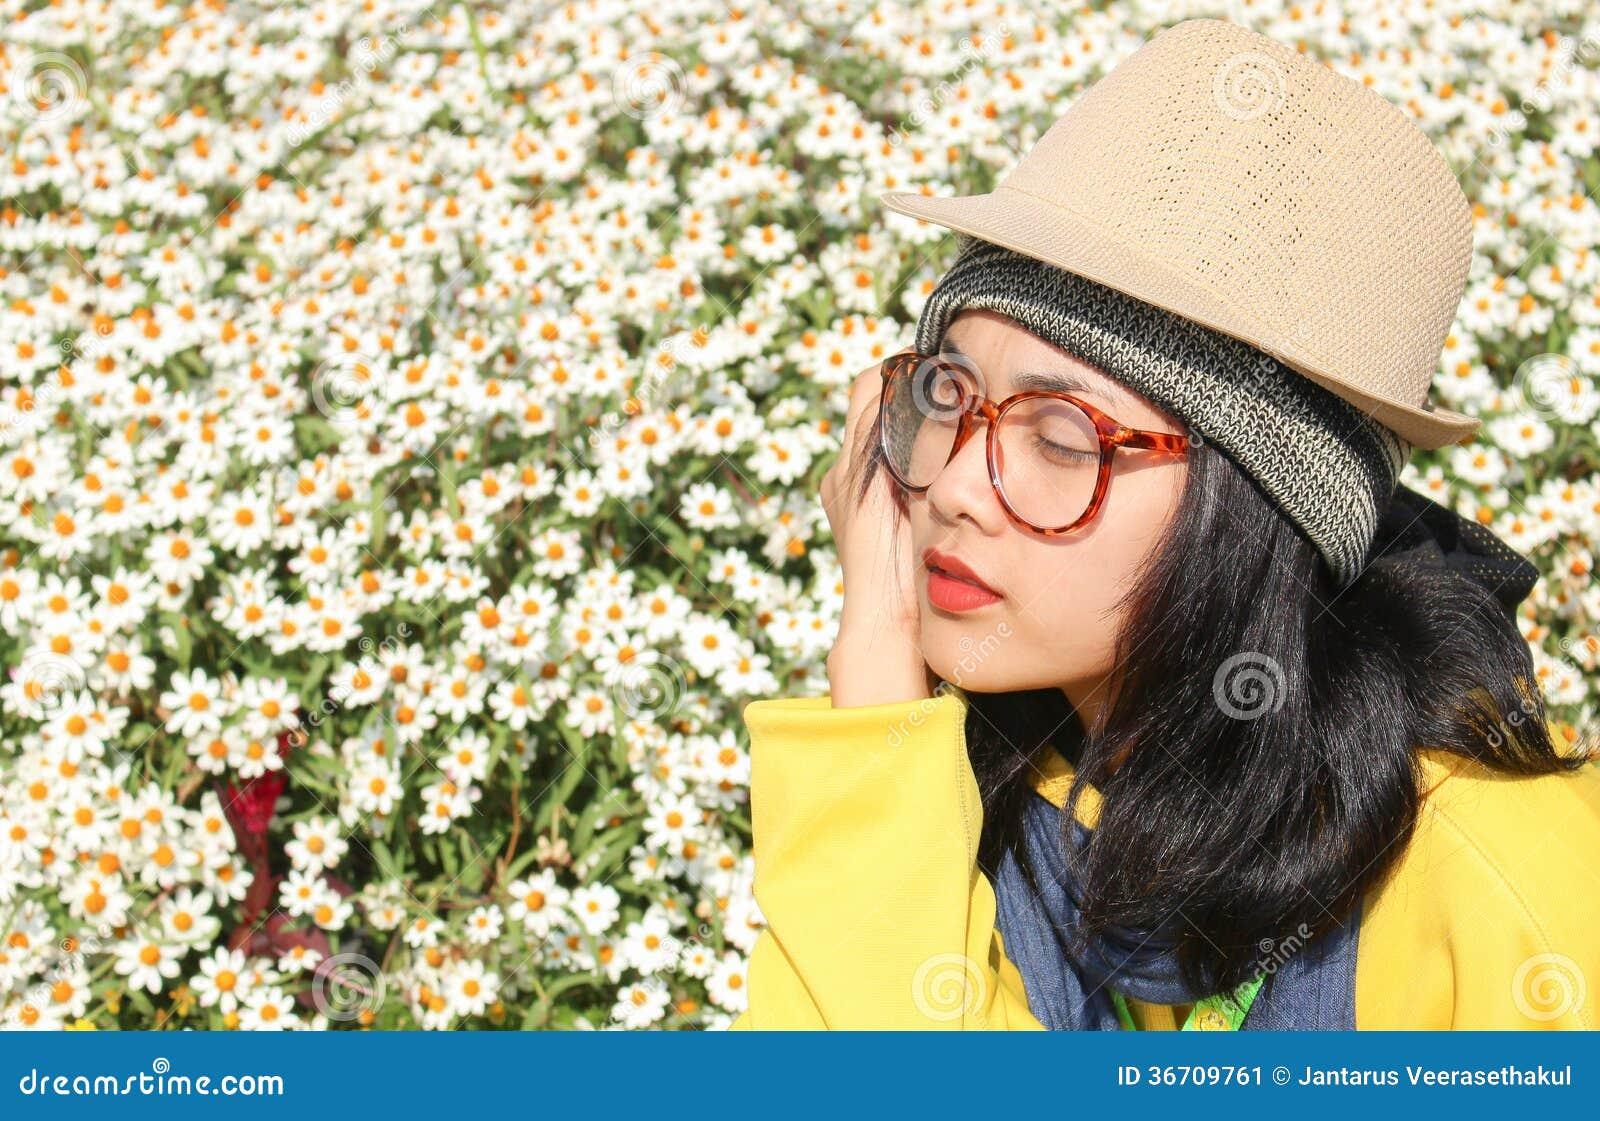 asian single women in winter garden Start meeting new people in winter garden with pof start browsing and  ask  orlando fl florida doit407 27 single man seeking women dating service.